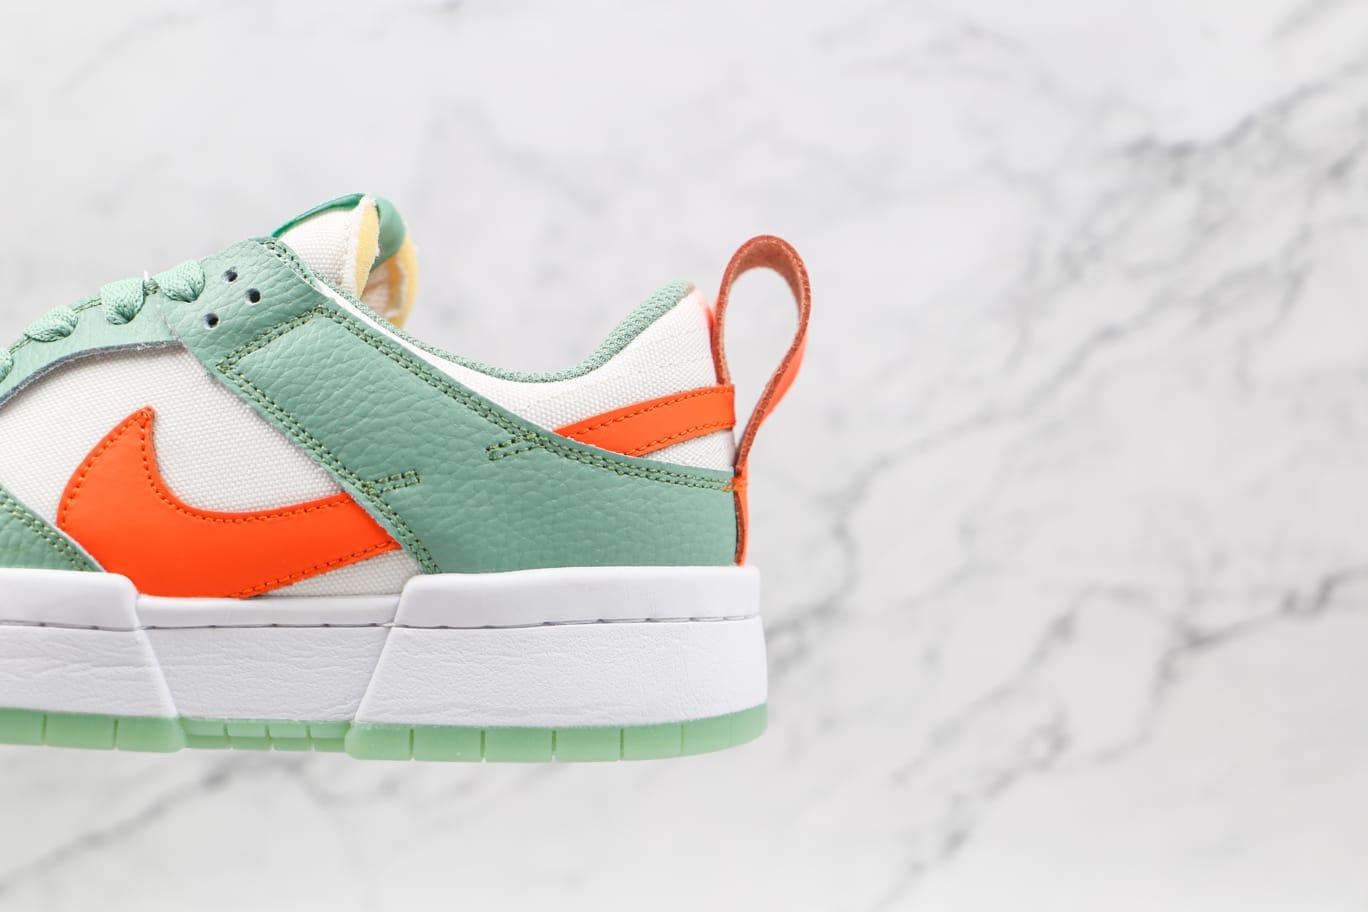 Wmns Nike Dunk Low Disrupt Sea Glass Crimson 6